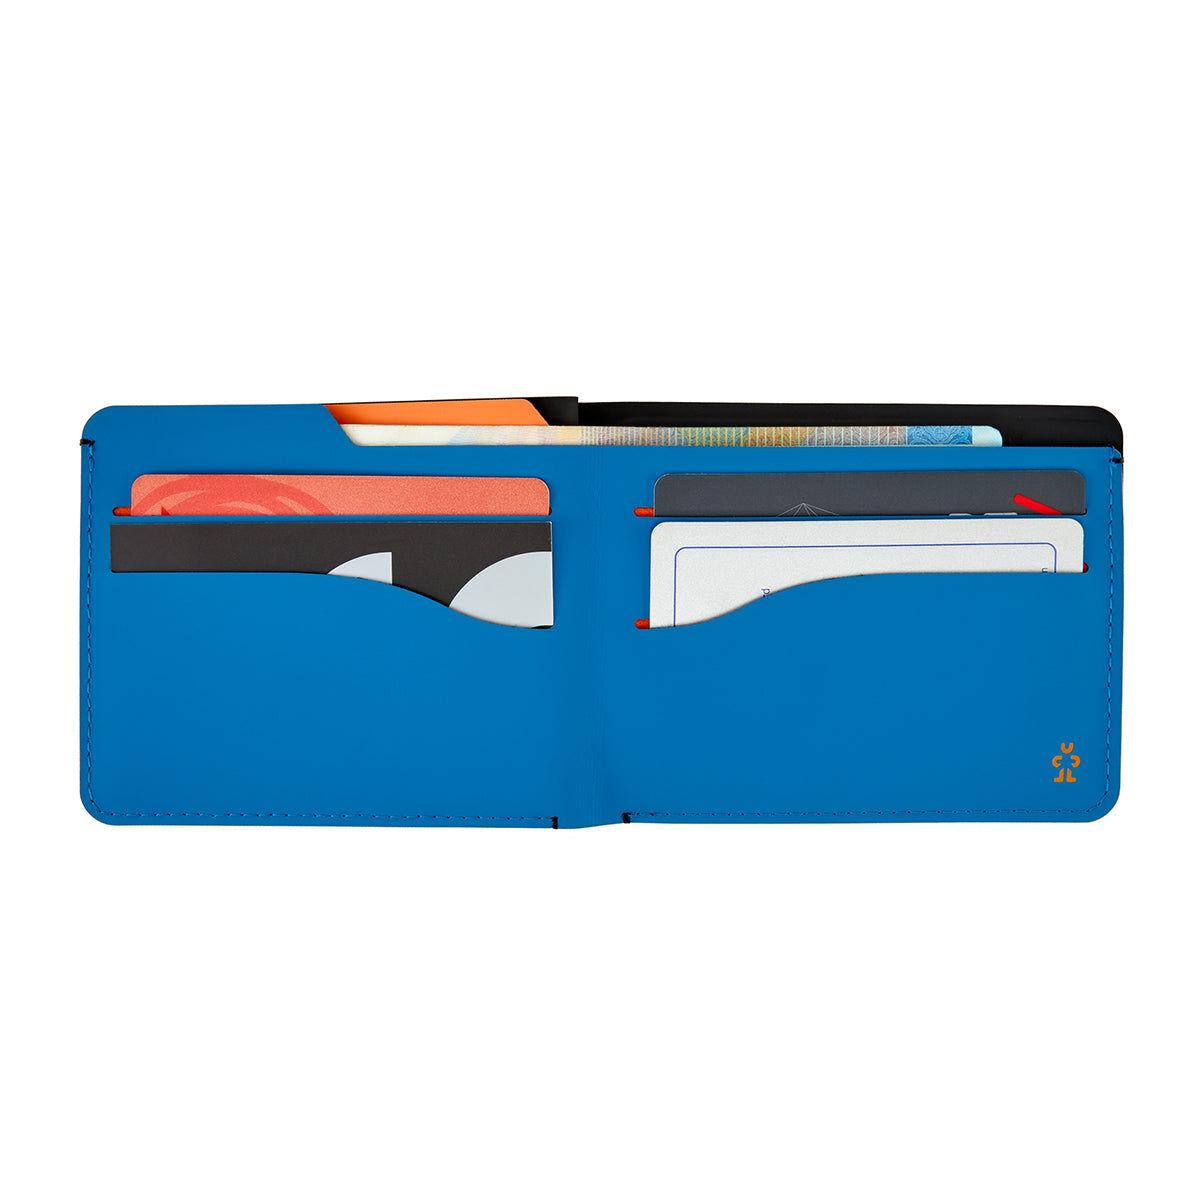 Crumpler Wallet black / niagra